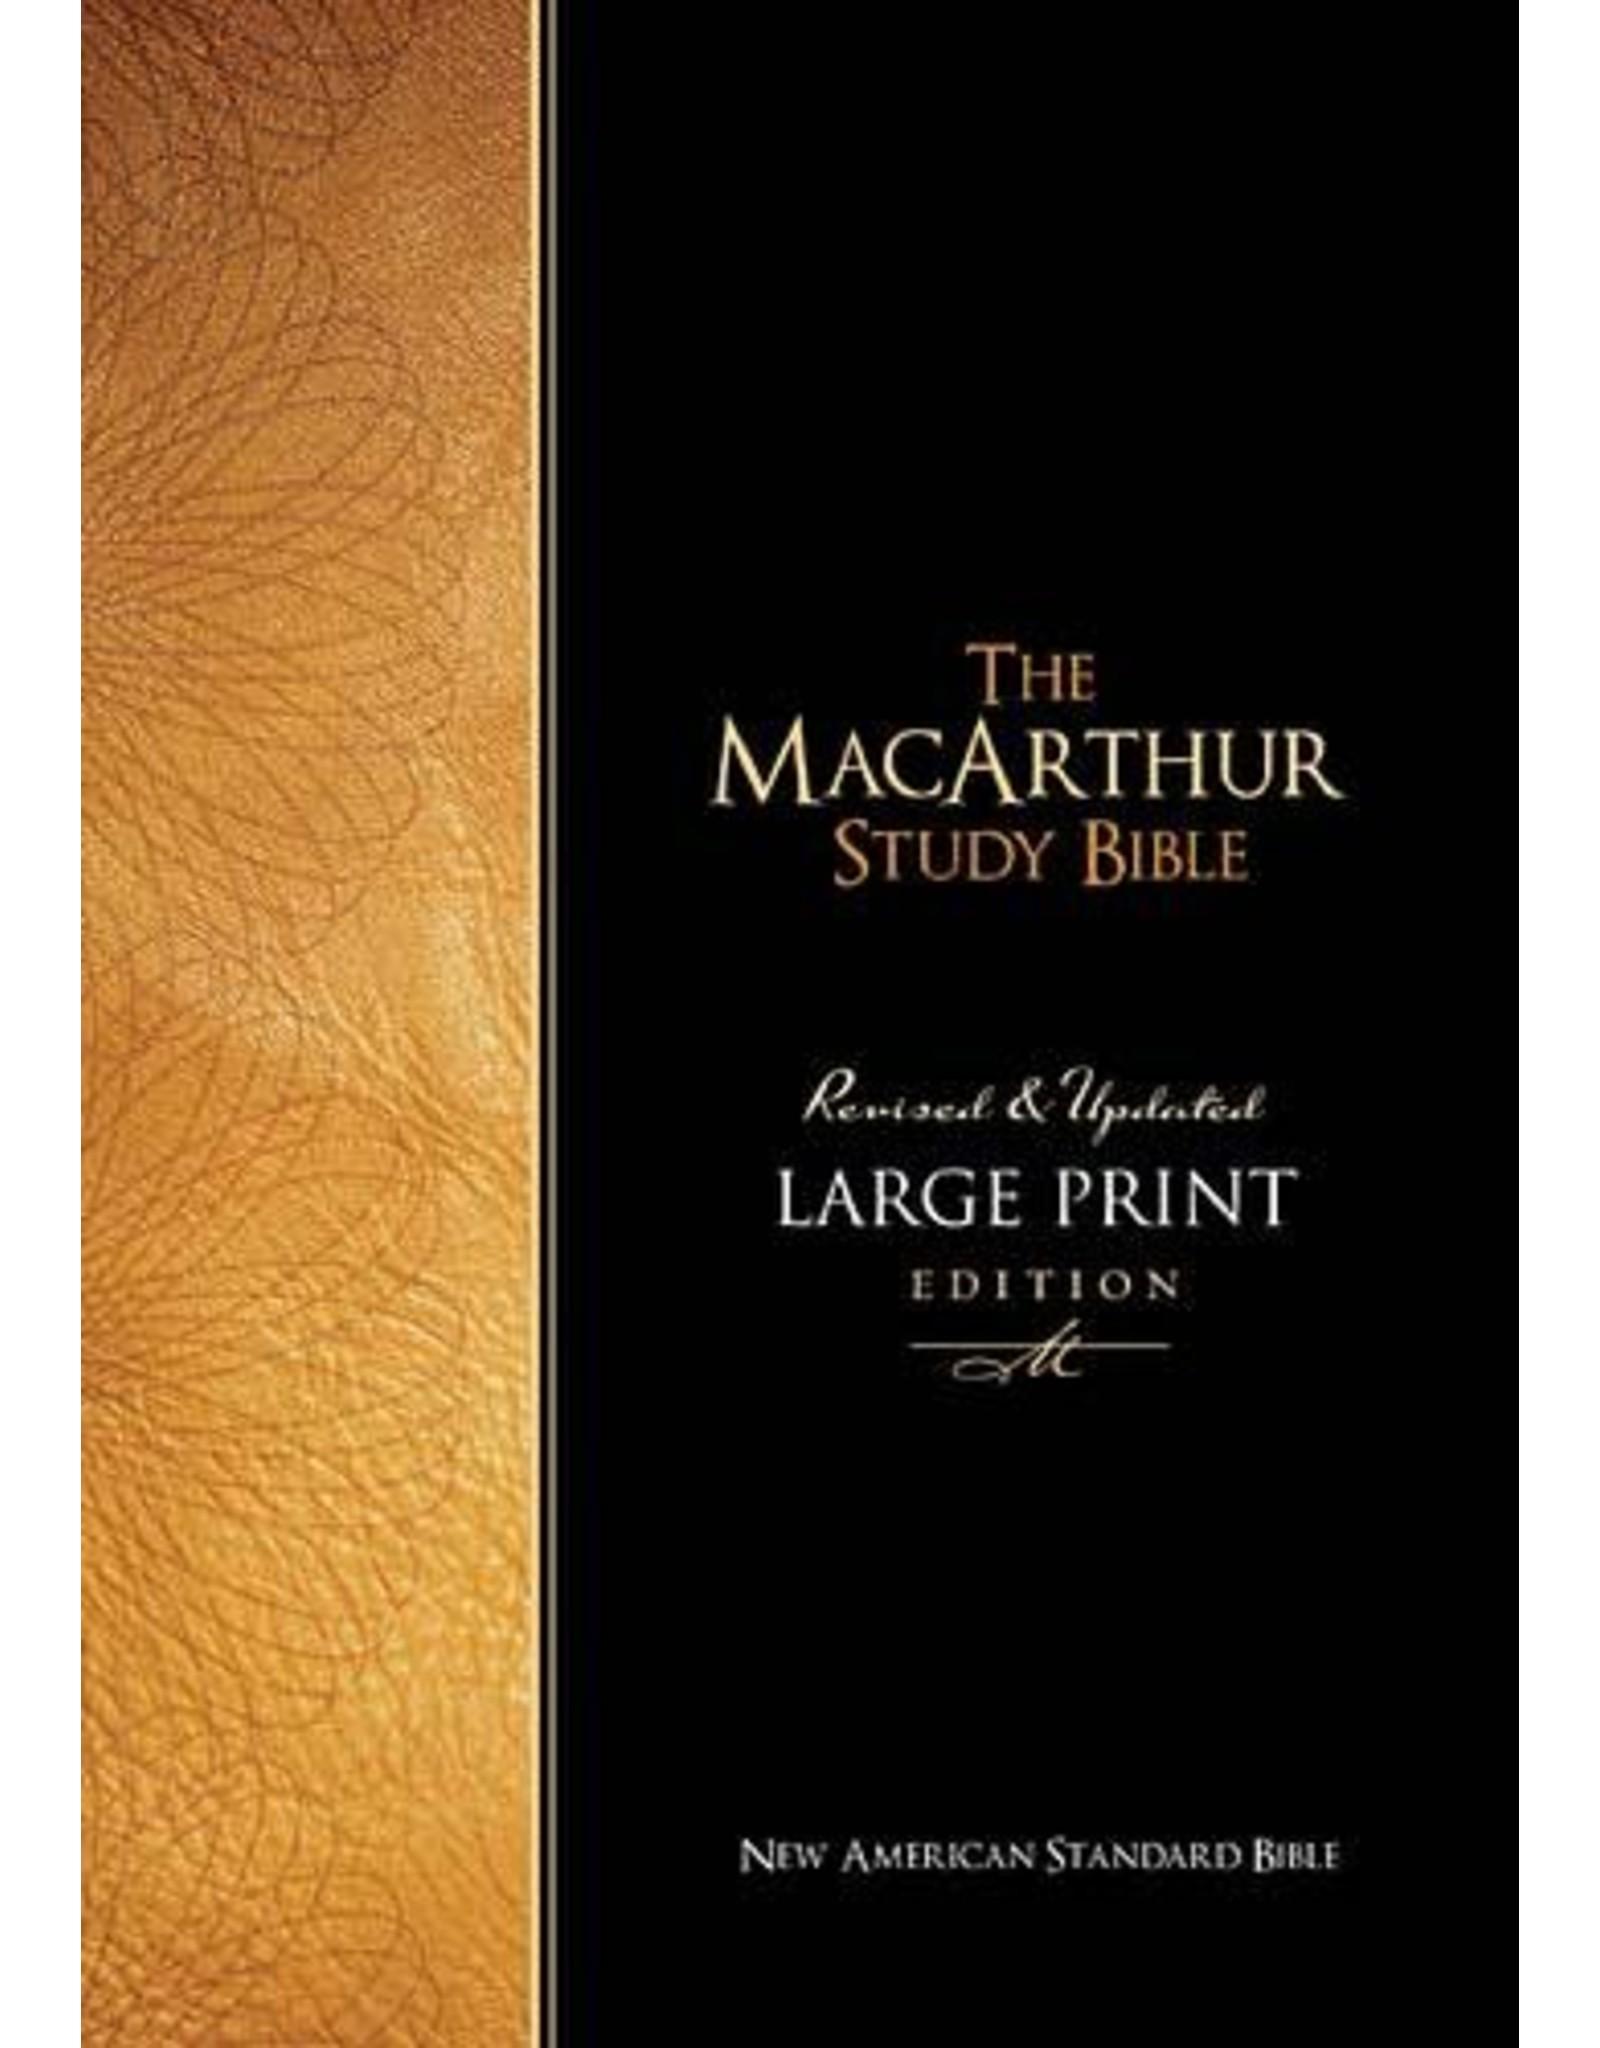 Harper Collins / Thomas Nelson / Zondervan MacArthur Study Bible: NASB Large Print, Bonded Leather